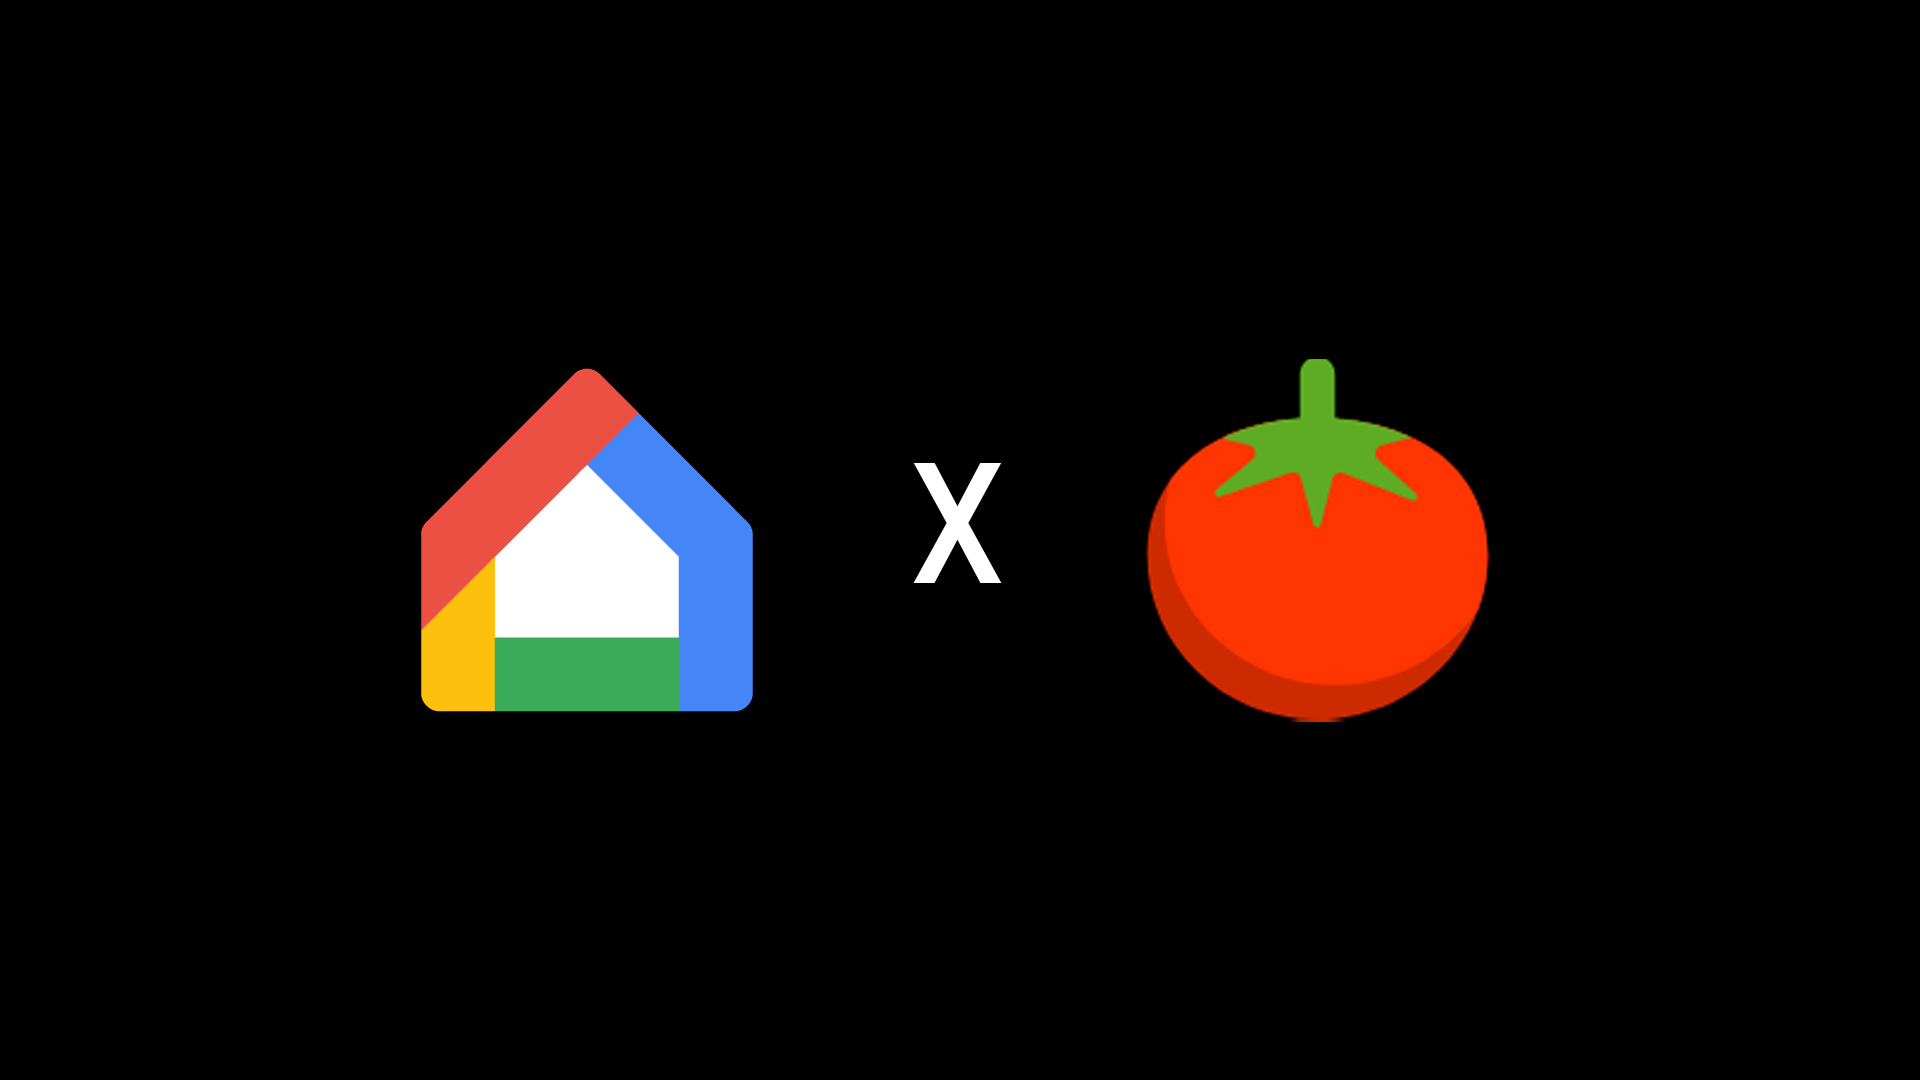 Utiliser la méthode pomodoro avec Google Home / Google Assistant